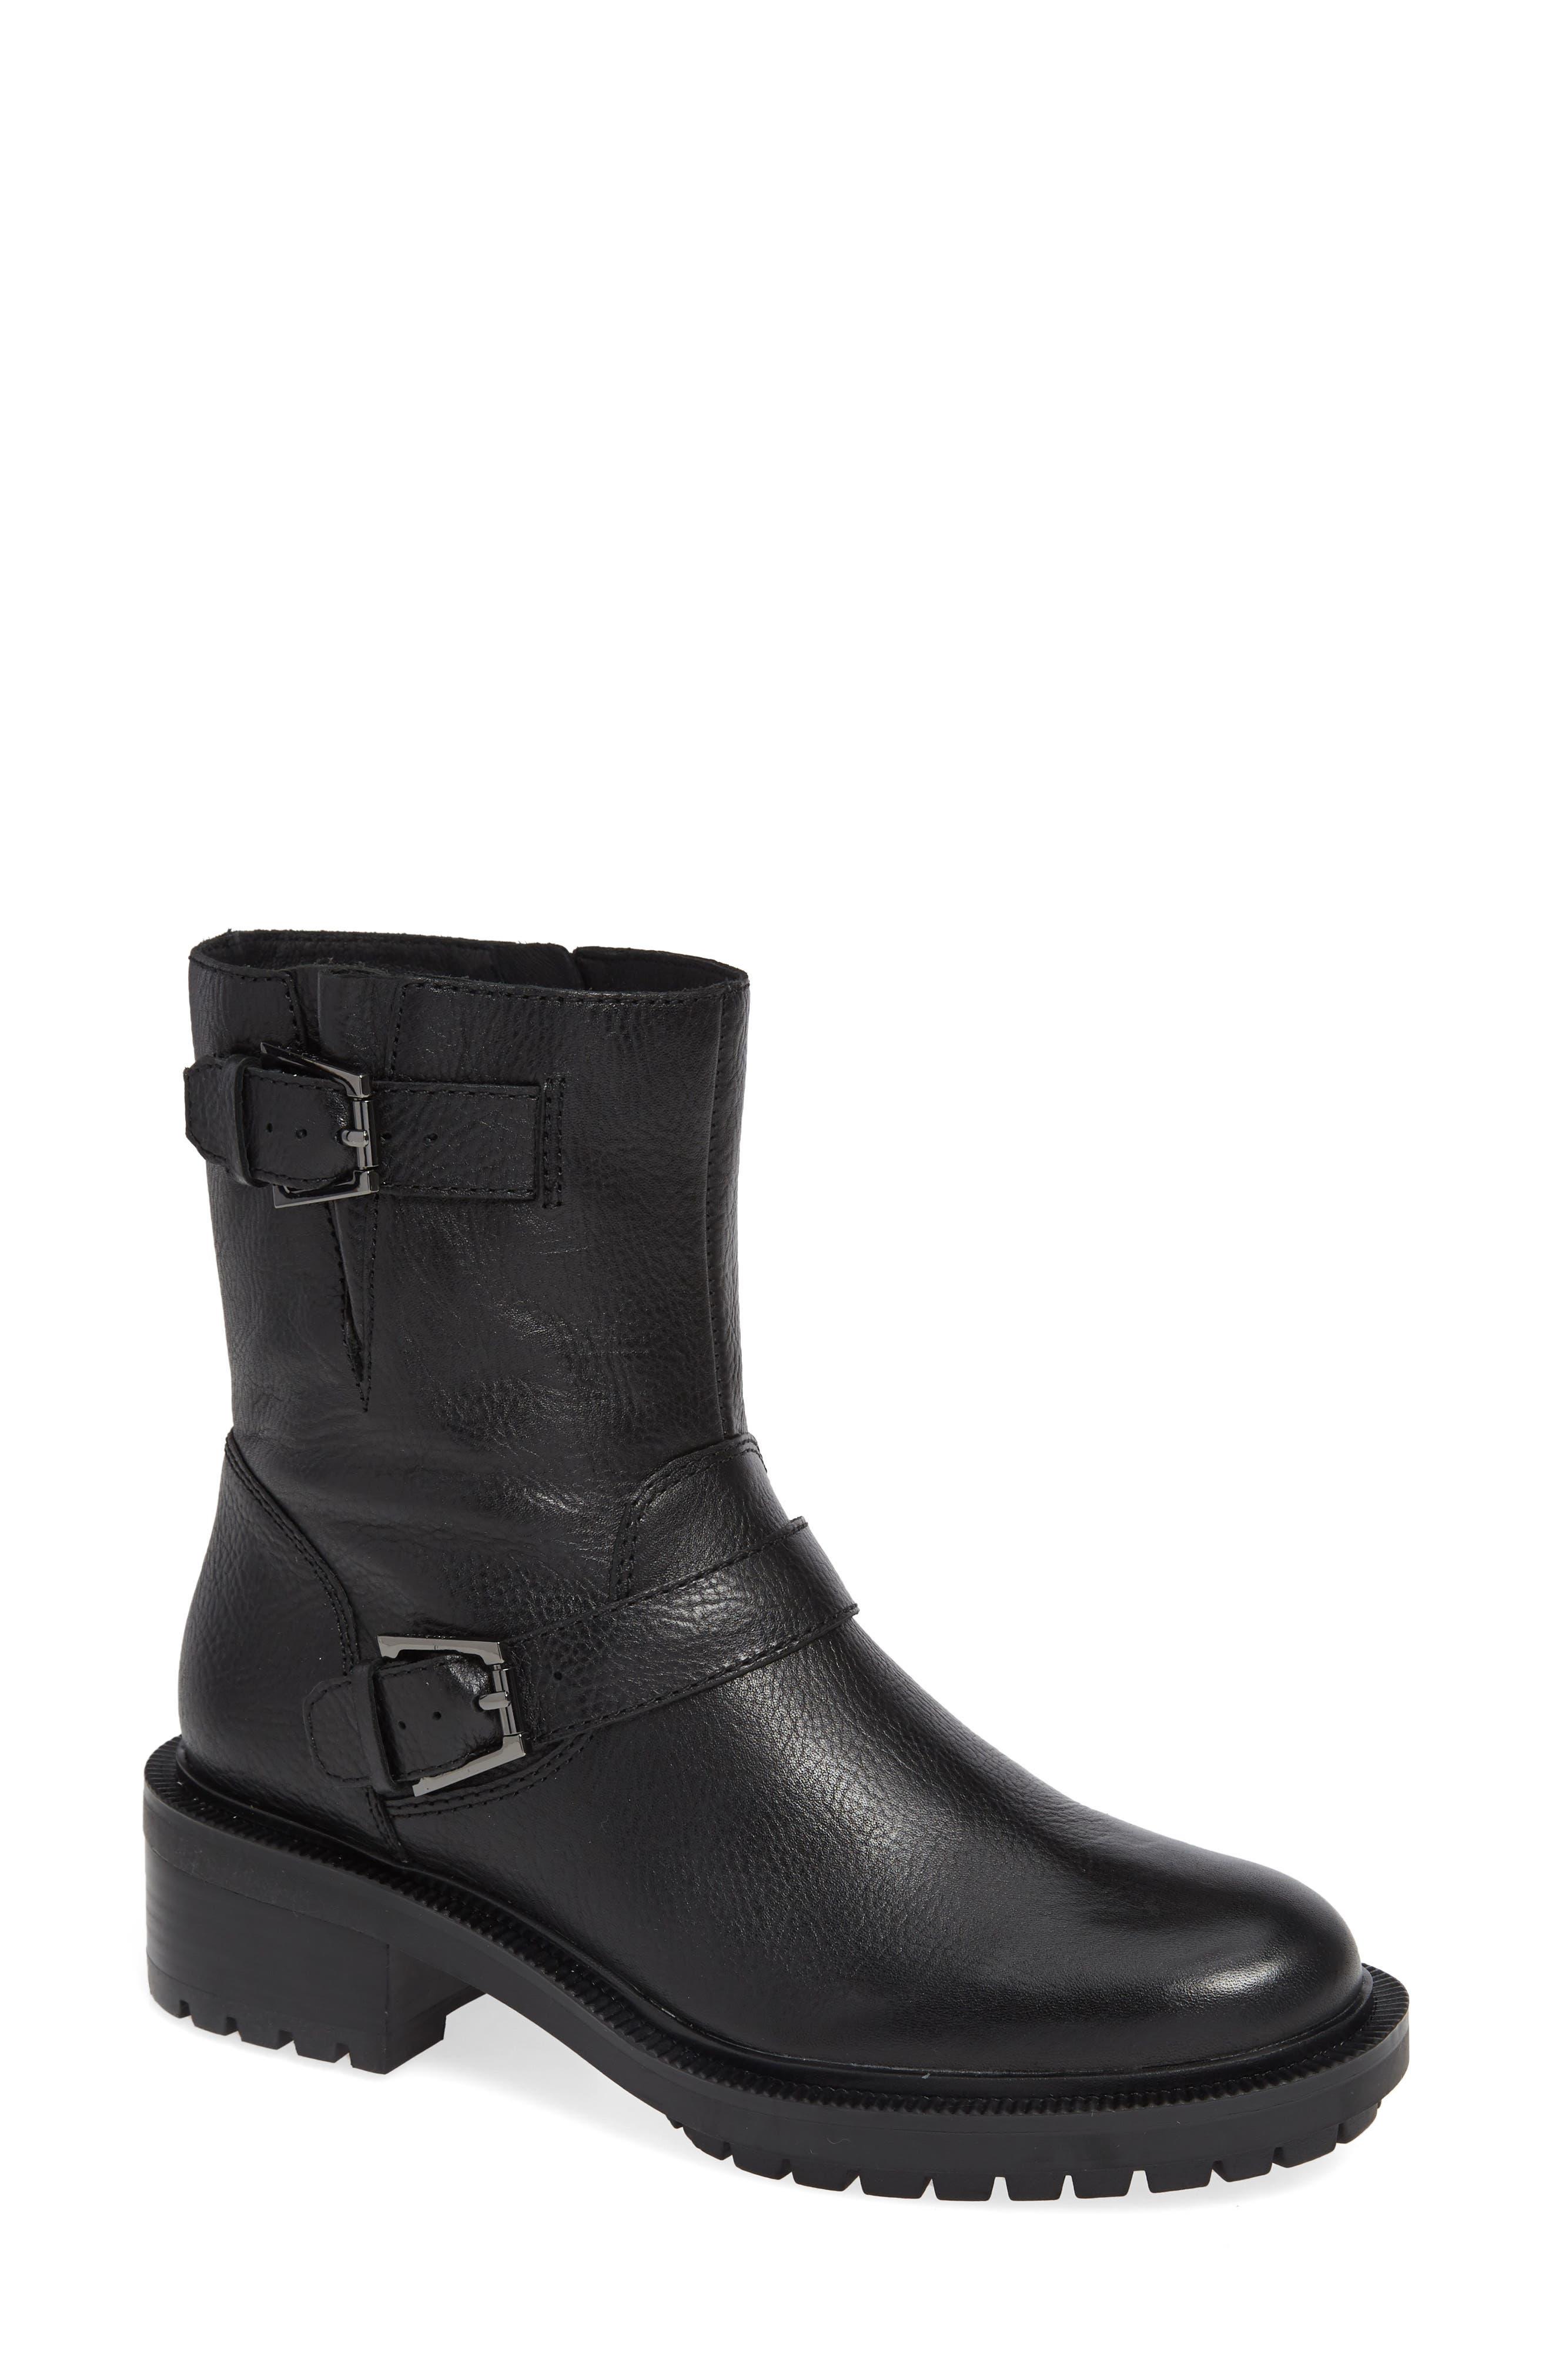 Botkier Marlow Boot- Black